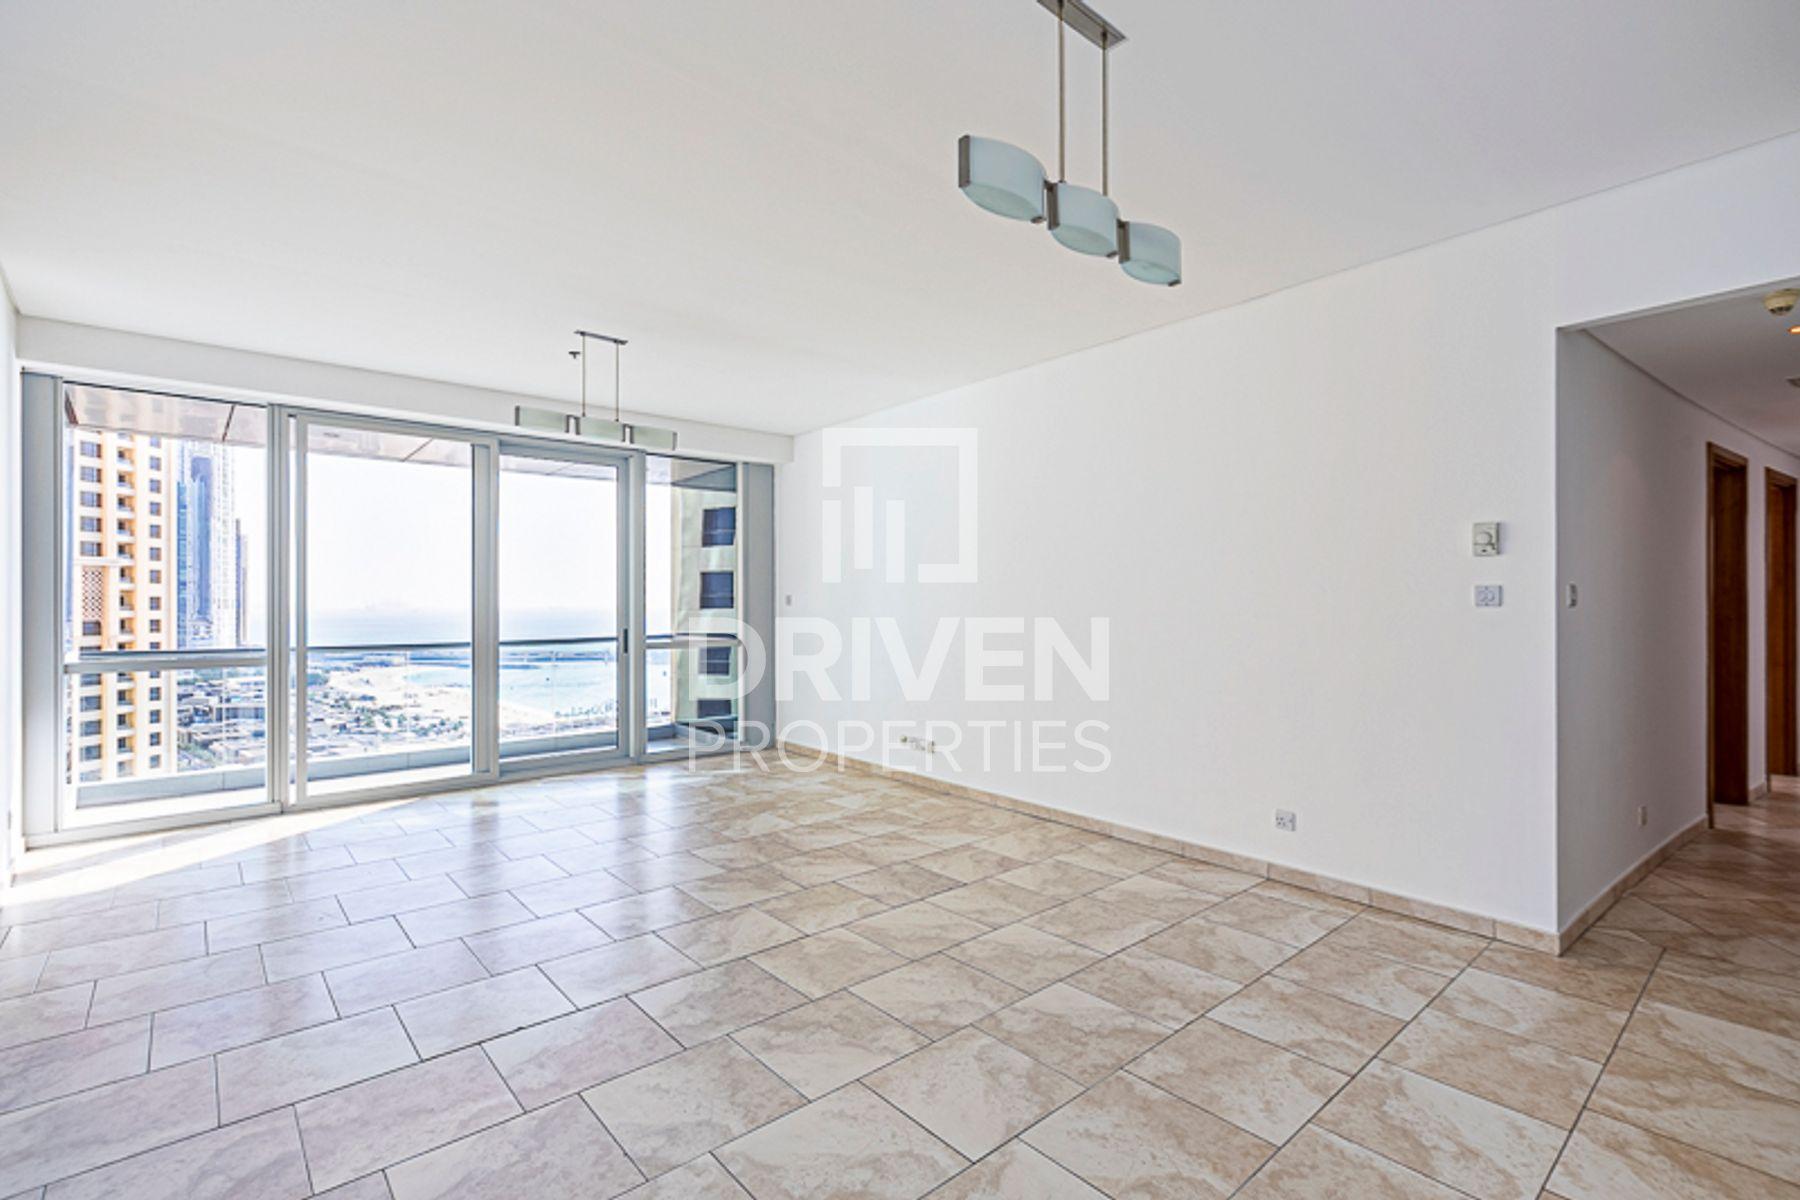 Apartment for Sale in Al Fattan Marine Tower - Jumeirah Beach Residence